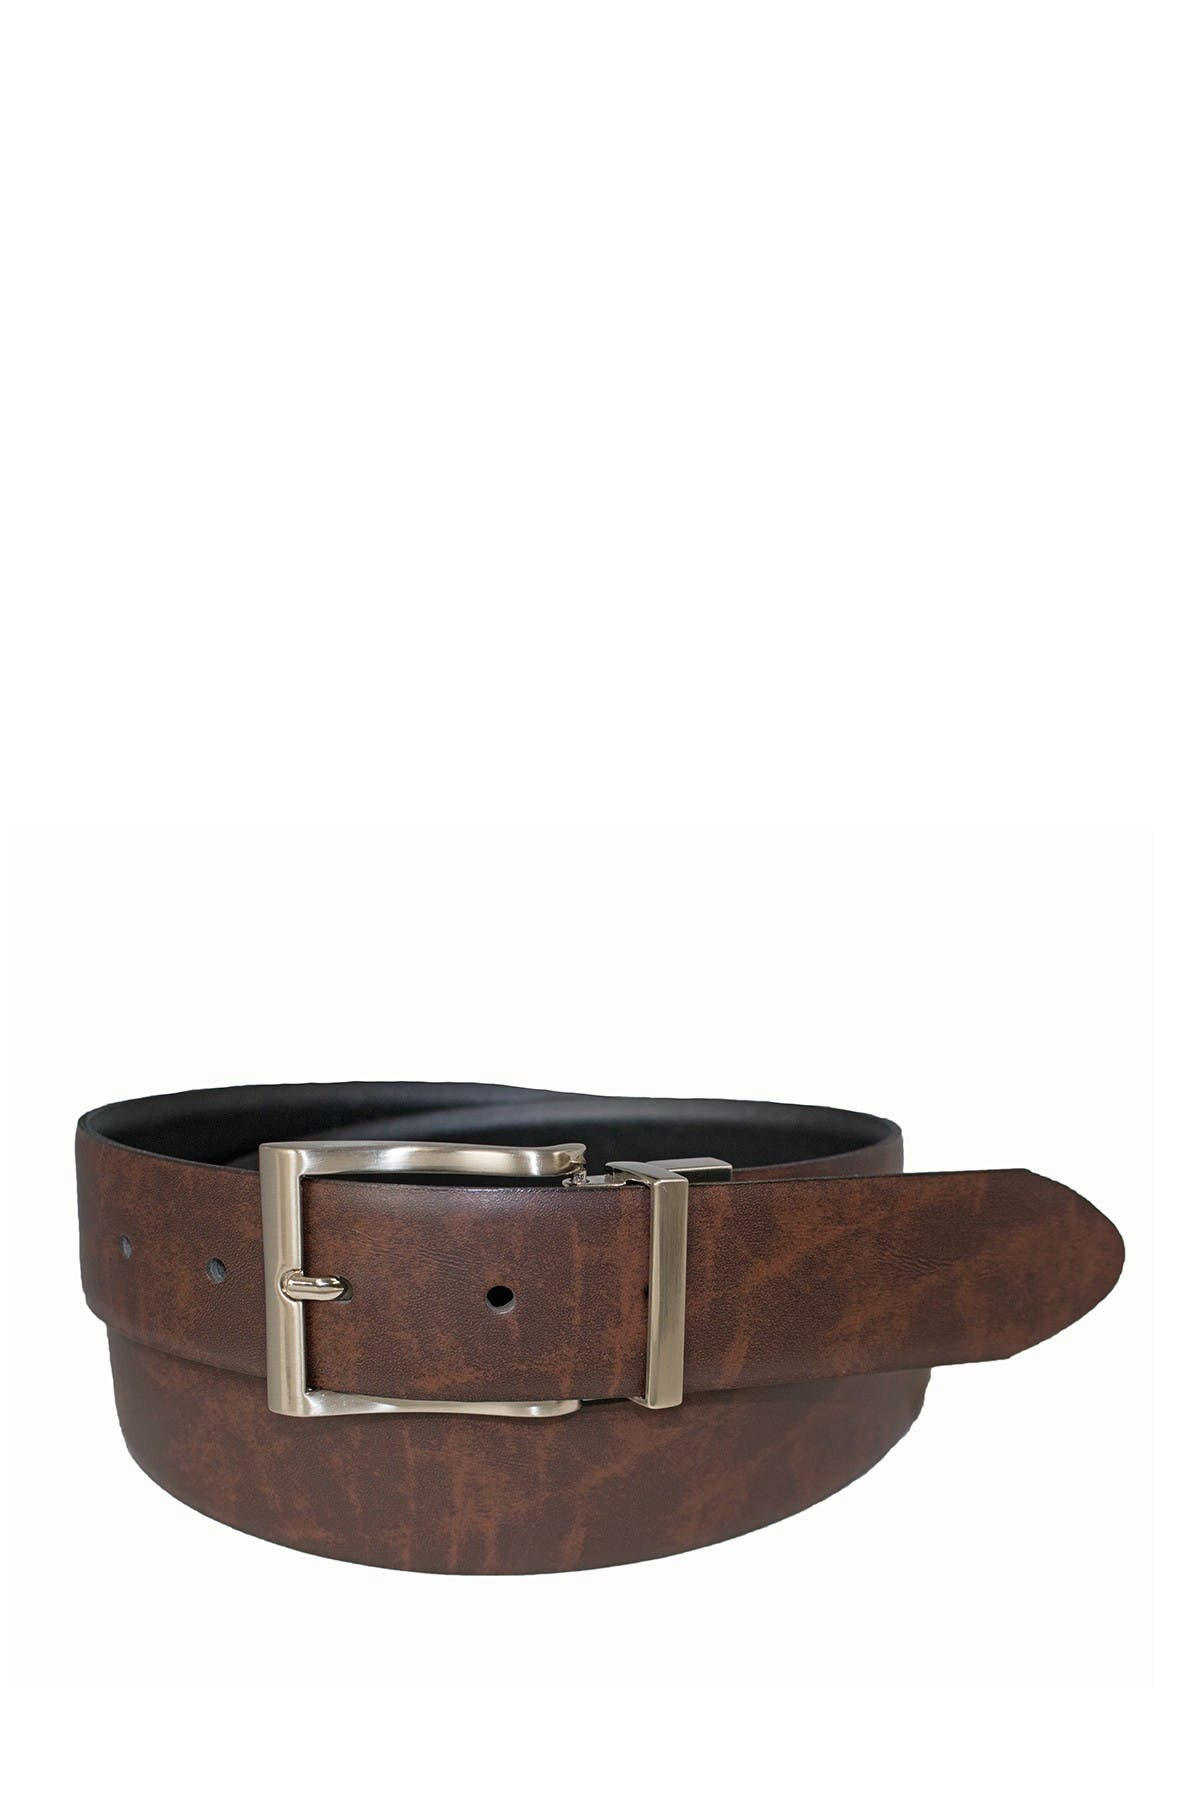 Image of BOSCA Reversible 35mm Marbled Leather Belt